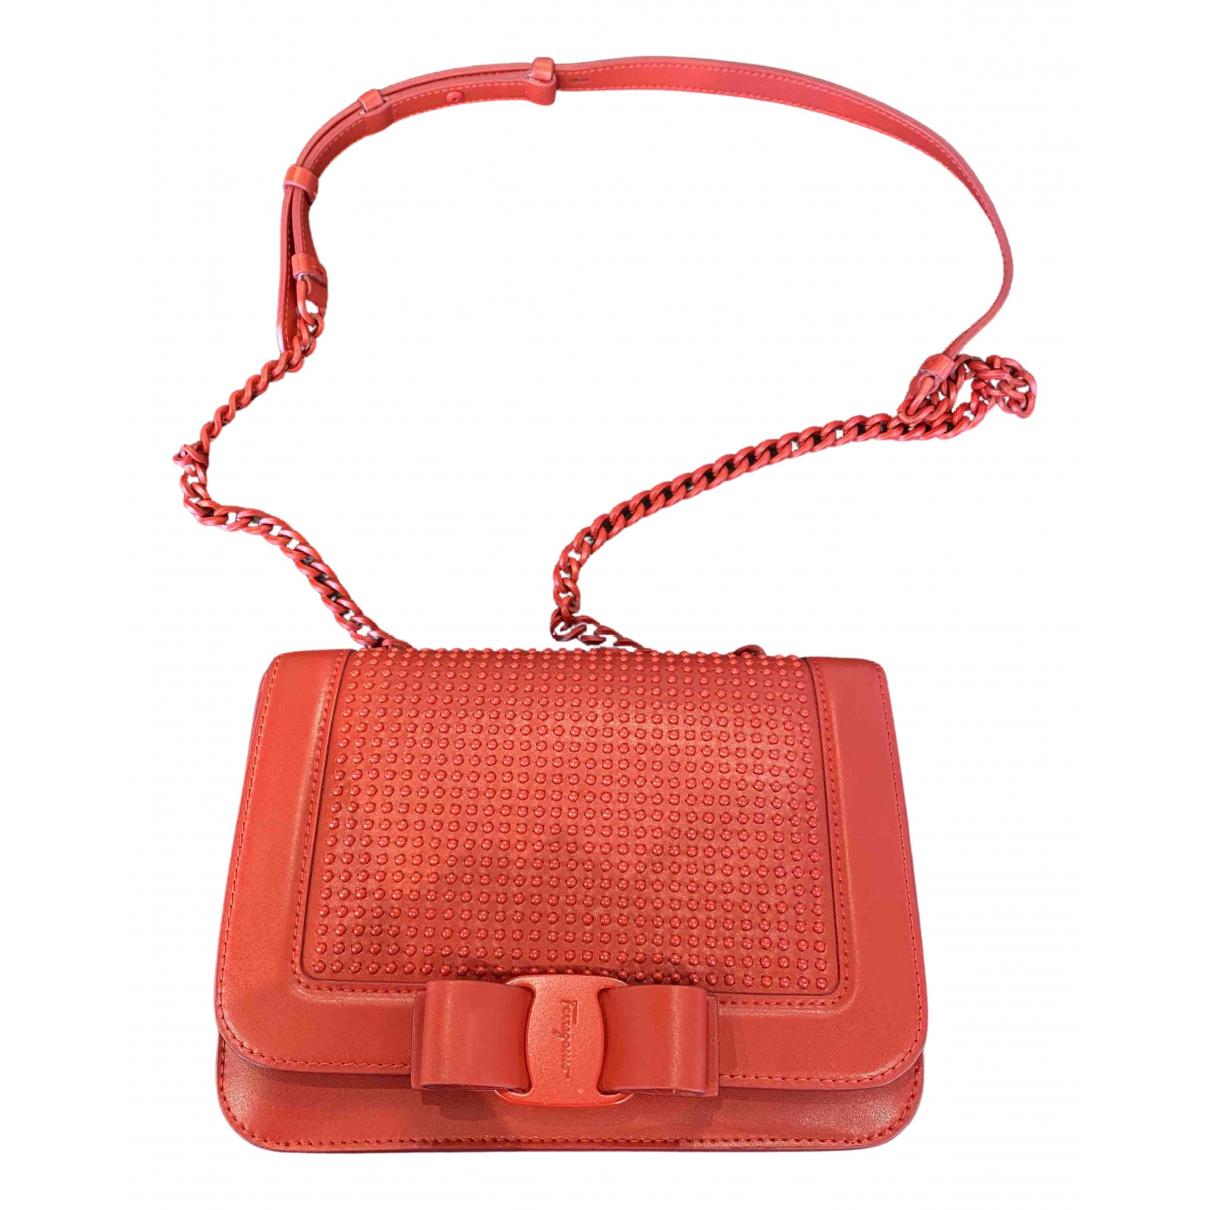 Salvatore Ferragamo Vara Red Leather handbag for Women N